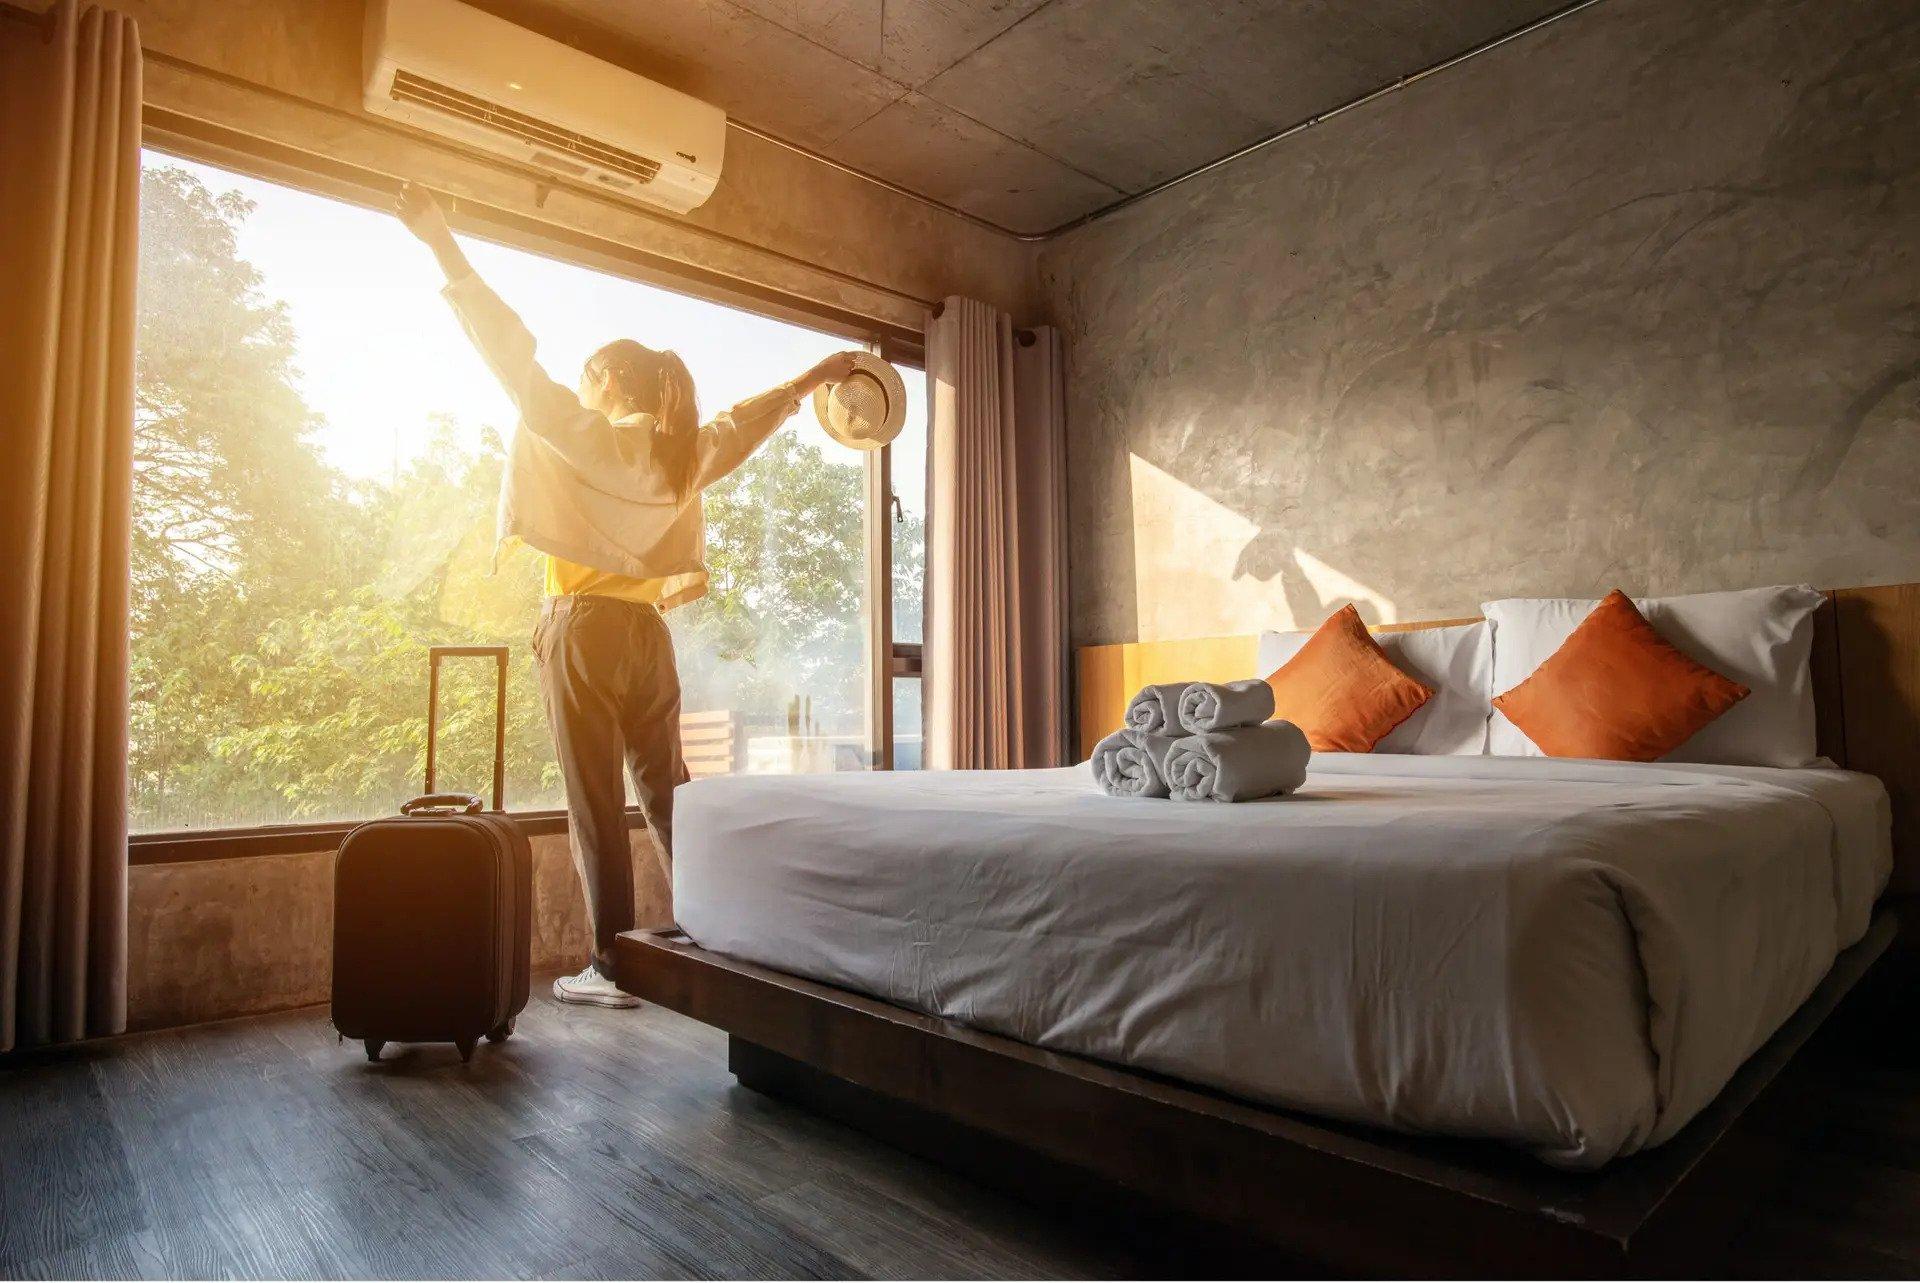 Inilah 4 Hotel Staycation Terbaik Di Jakarta Travelmaker Indonesia